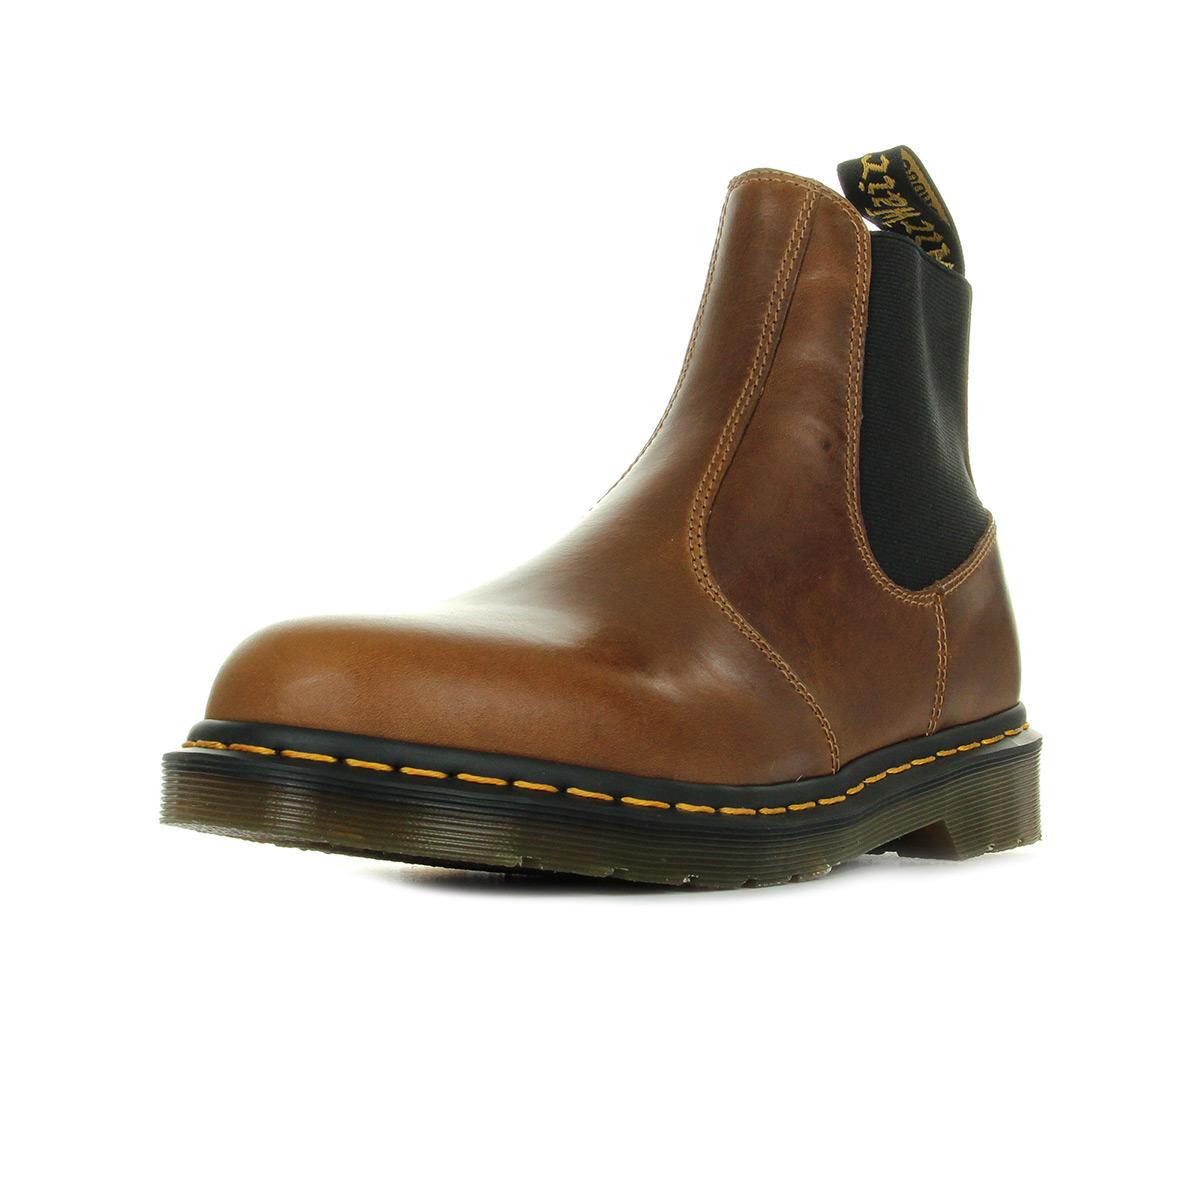 timeless design 5add7 4d4bd ... Dr Martens Hardy Butterscotch - Livraison Gratuite avec - Chaussures  Boot Homme